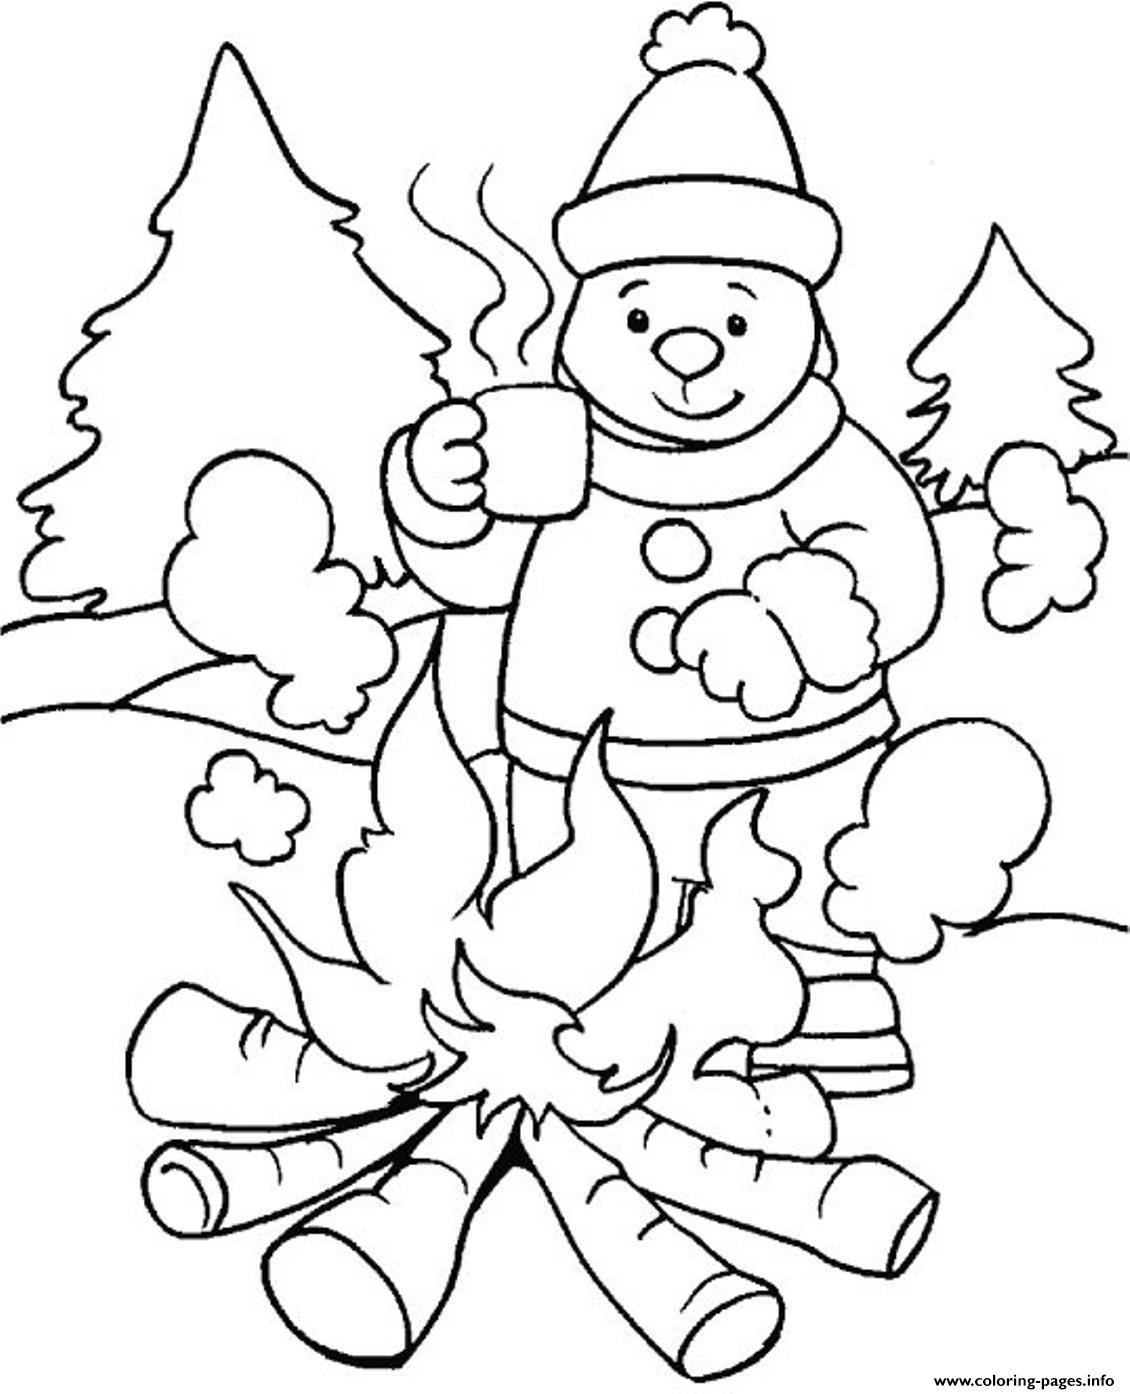 Little Snowflake Worksheet